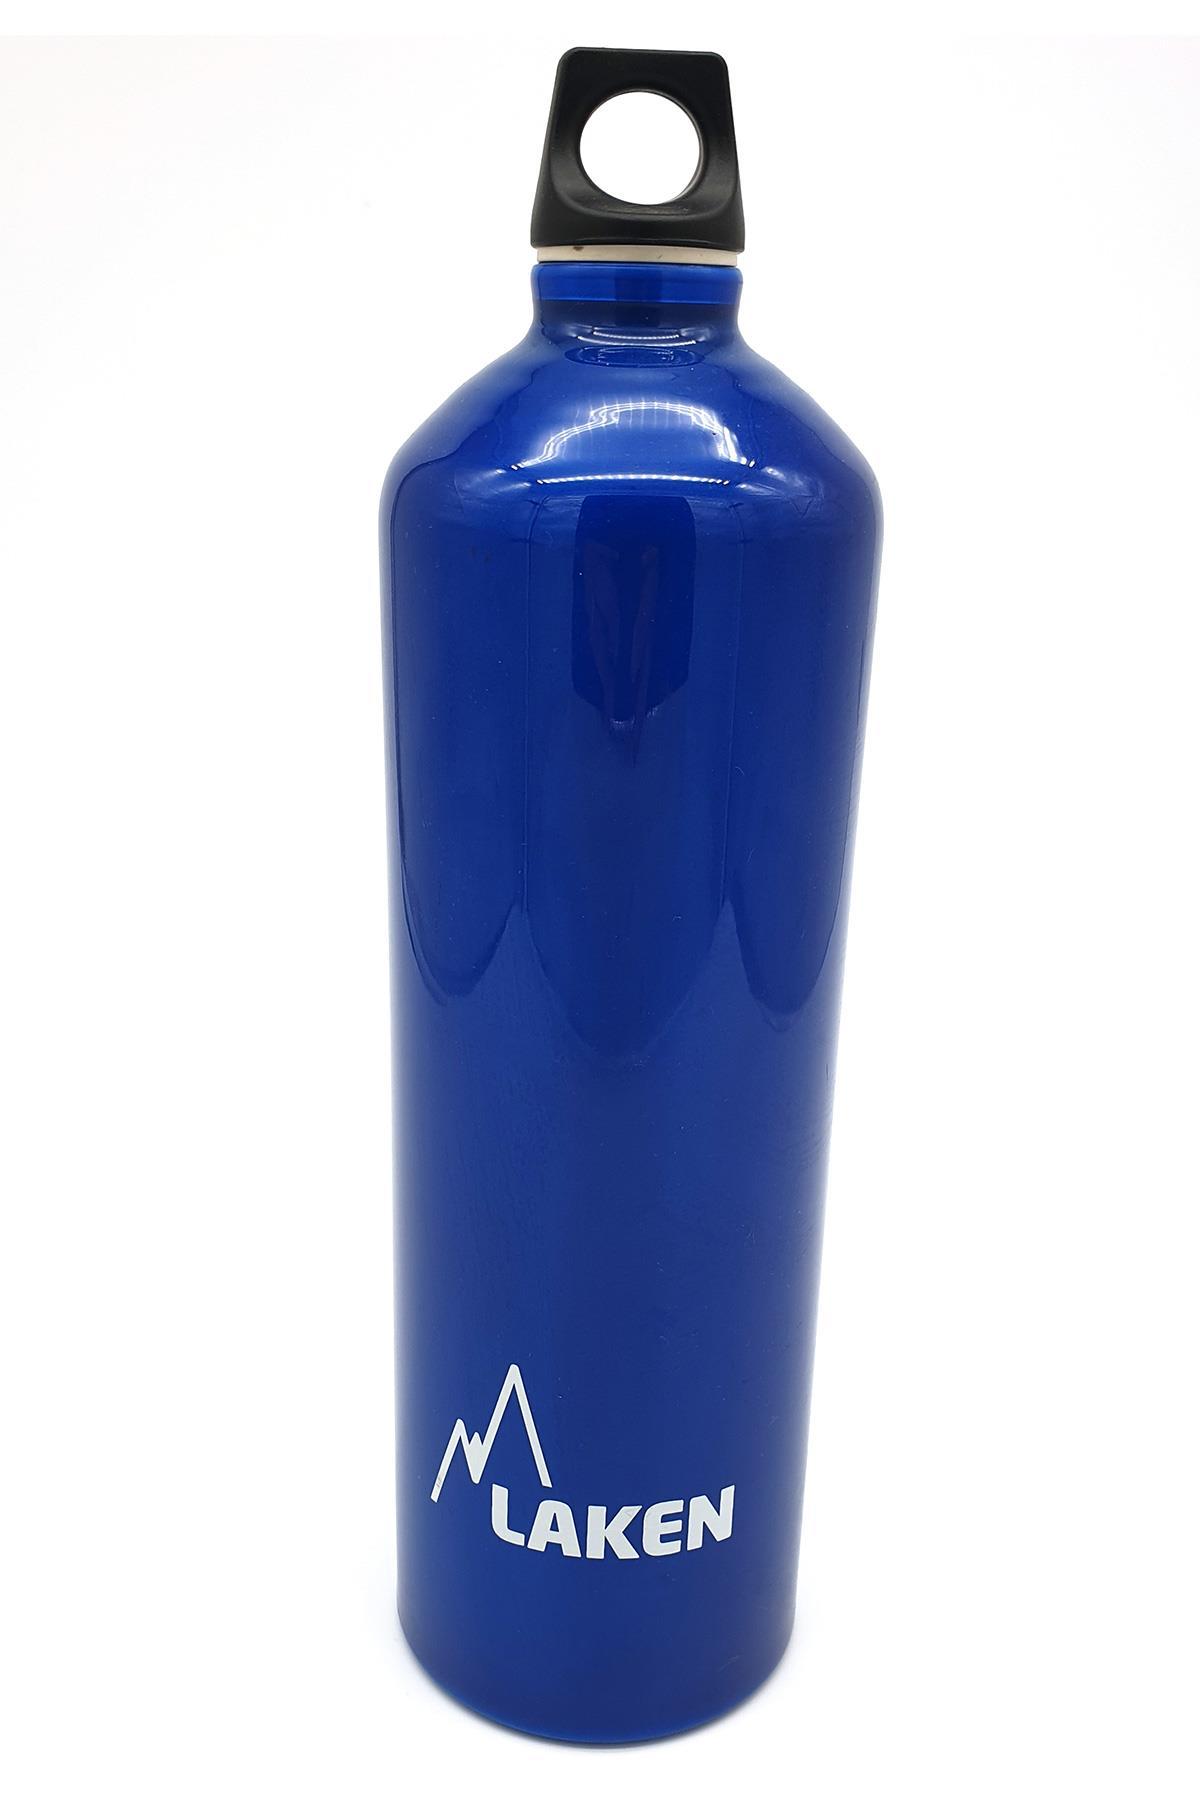 Laken İspanya Üretimi Alüminyum Futura Sise 1,5L Mavi Lk74